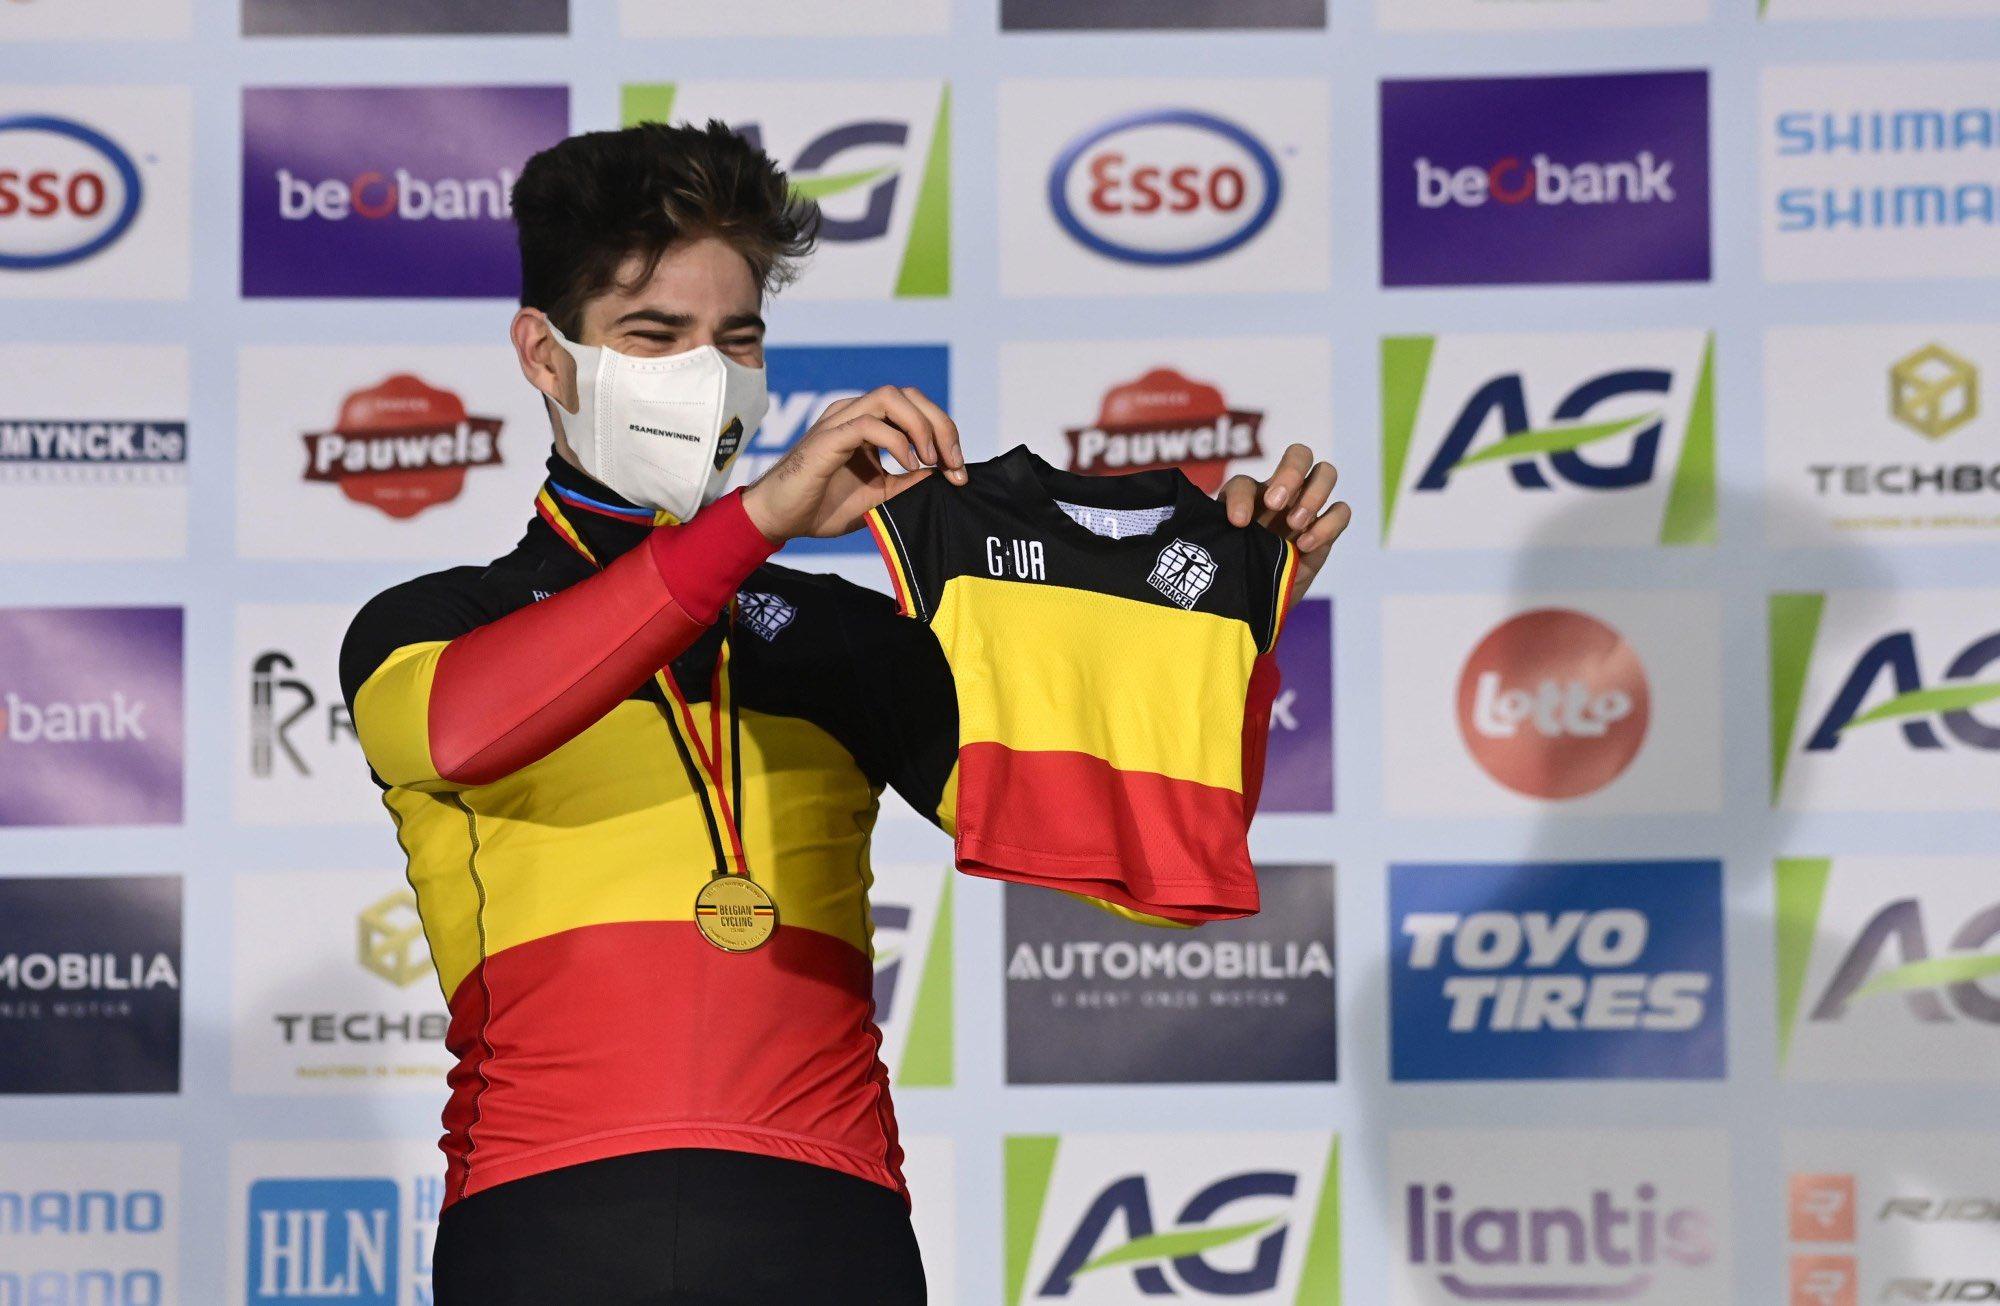 CX: Van Aert domina nacionais belgas, Venturini vence em França!